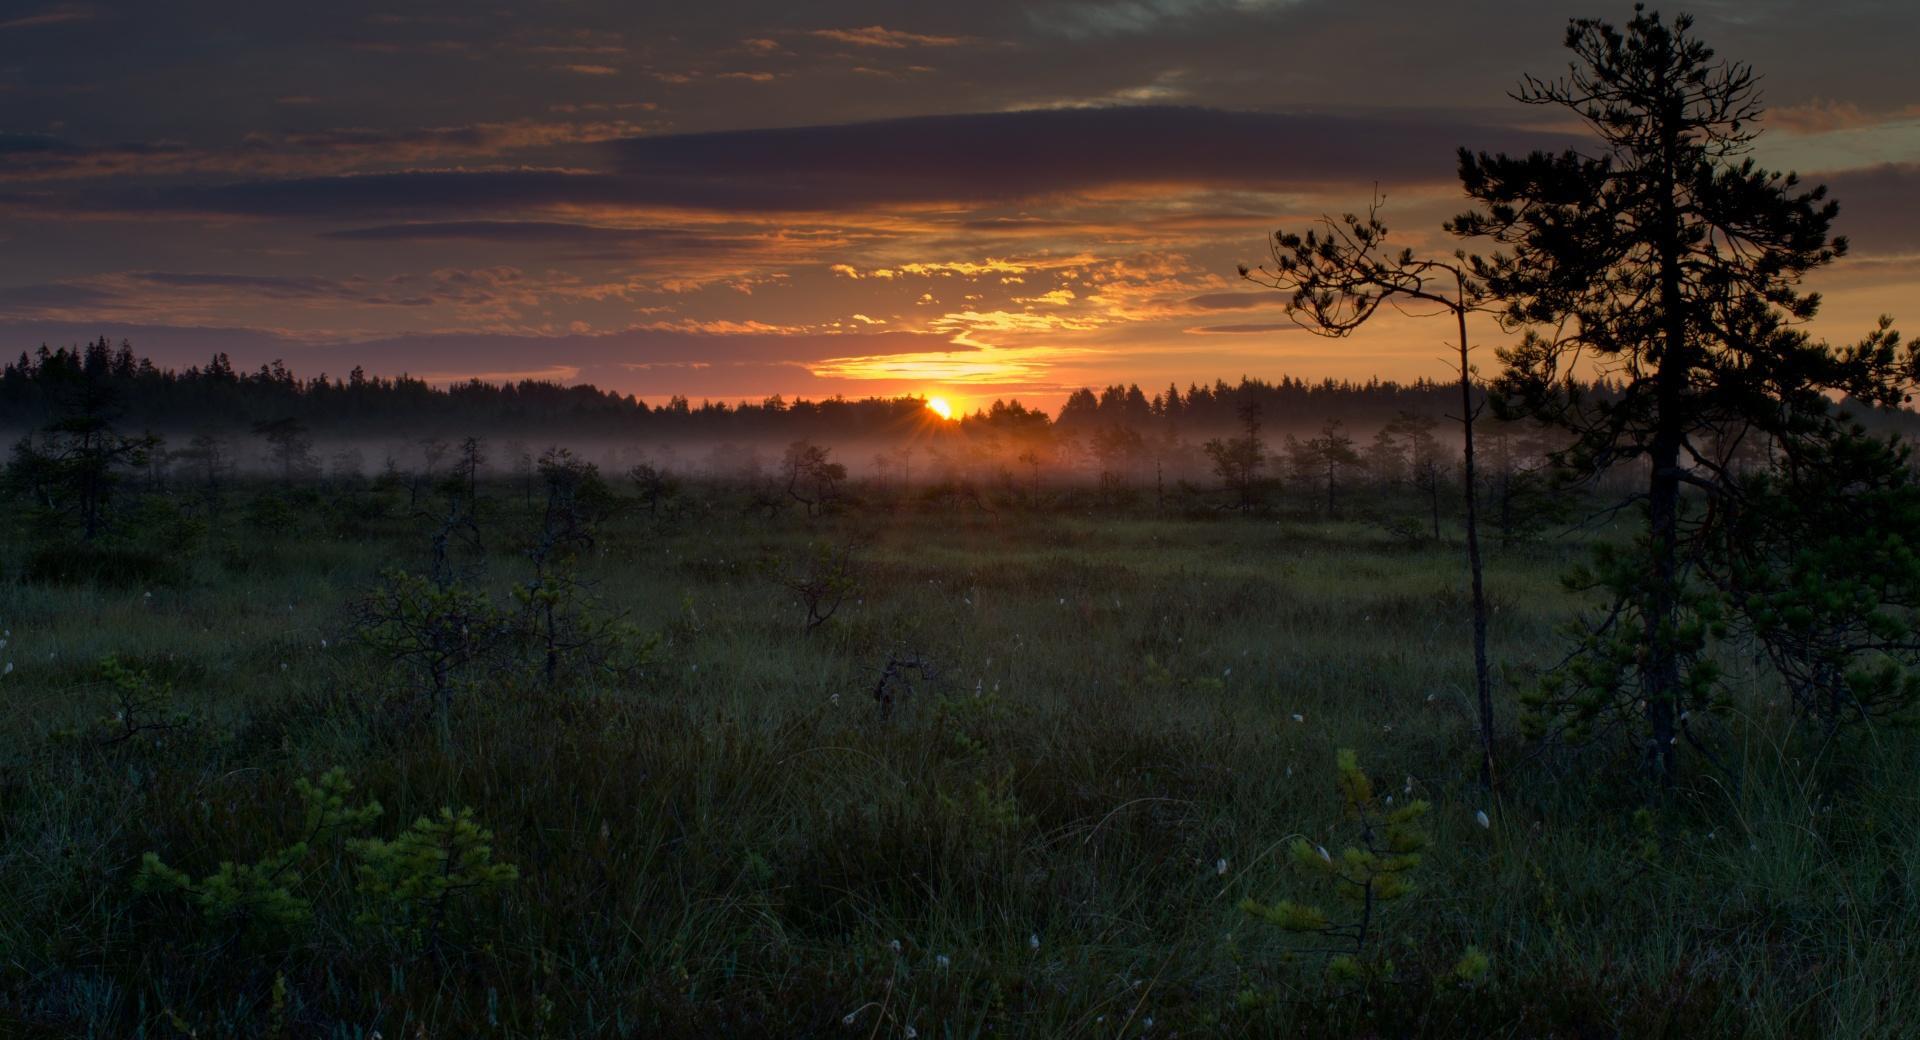 Valkmusa Sunrise wallpapers HD quality